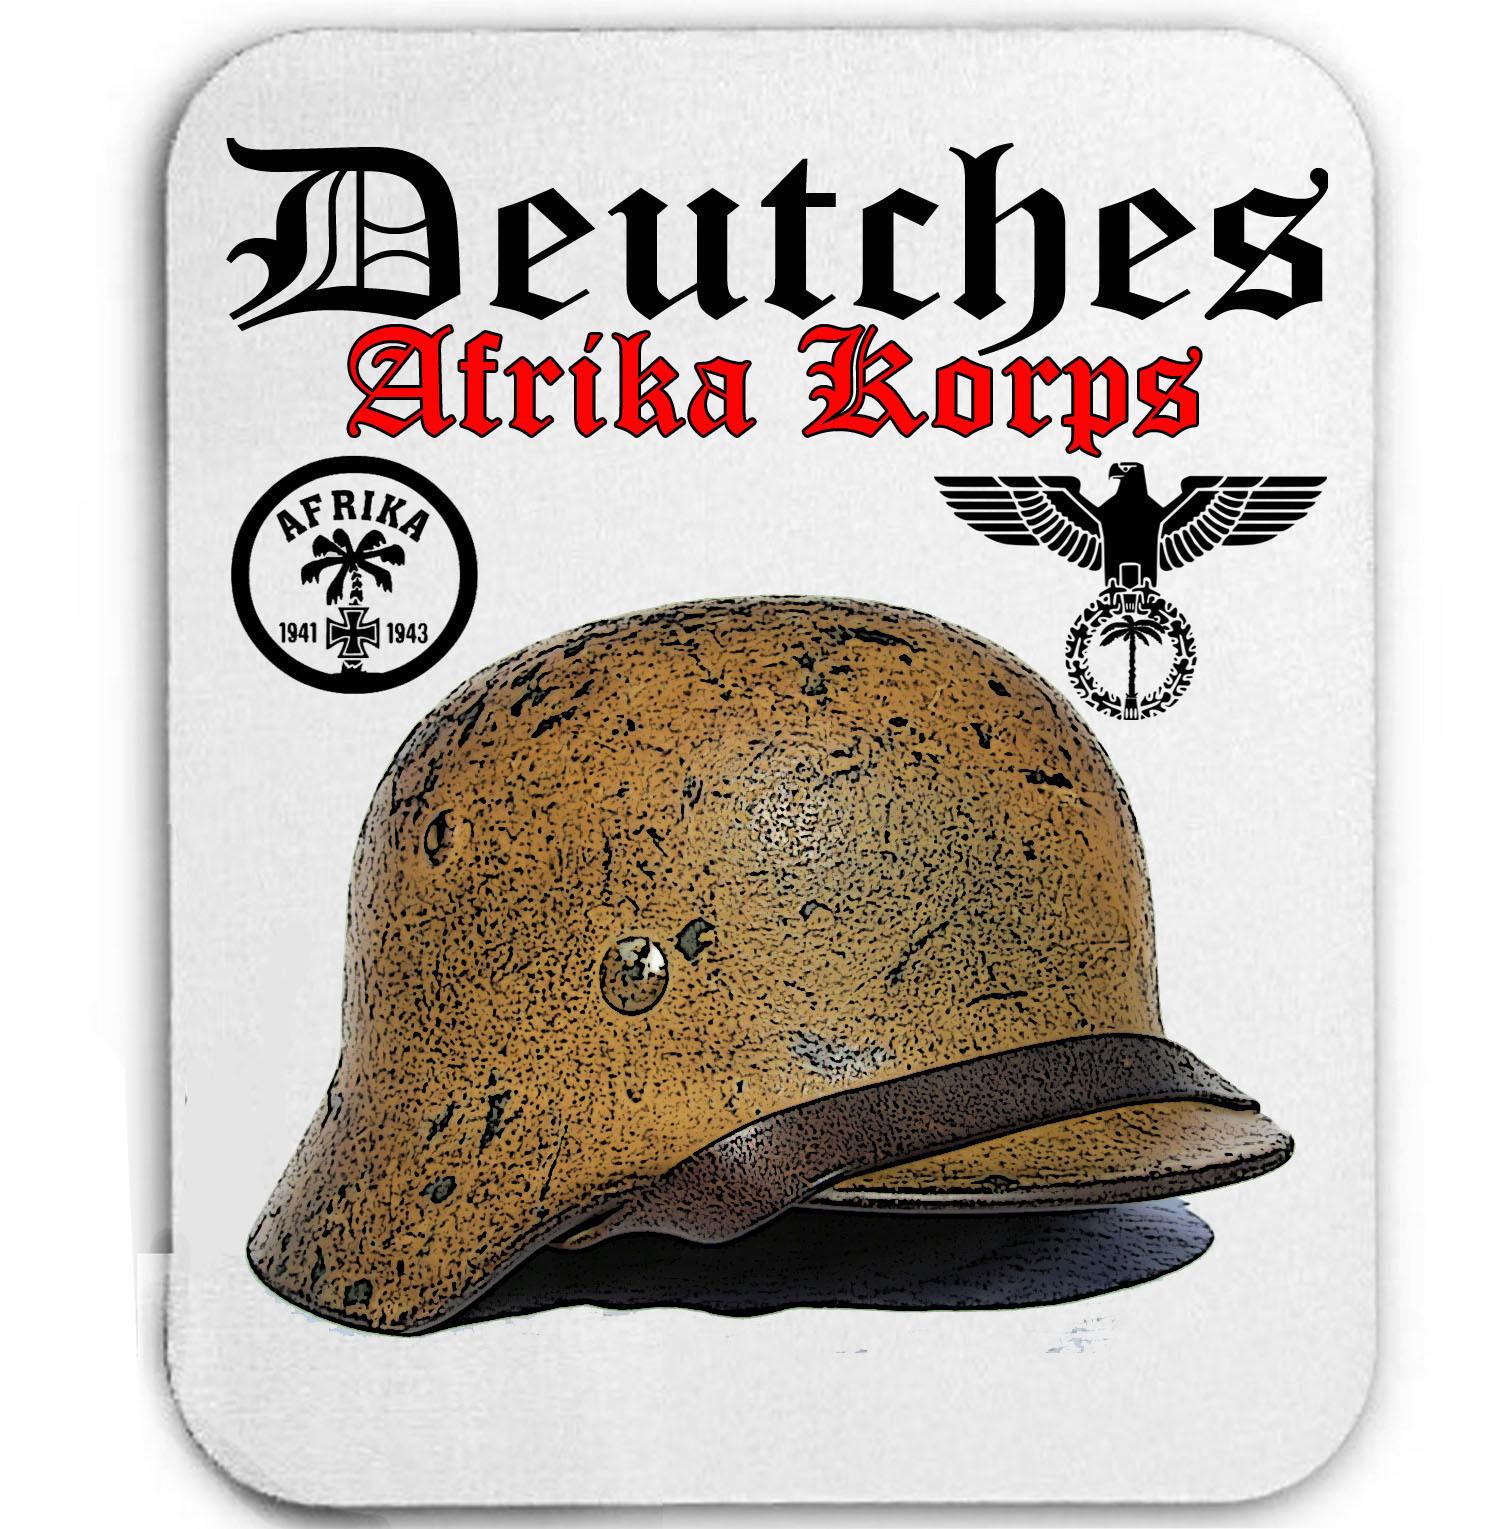 DEUTCHES AFRIKA KORPS GERMANY WWII - MOUSE MAT/PAD AMAZING DESIGN - $14.05